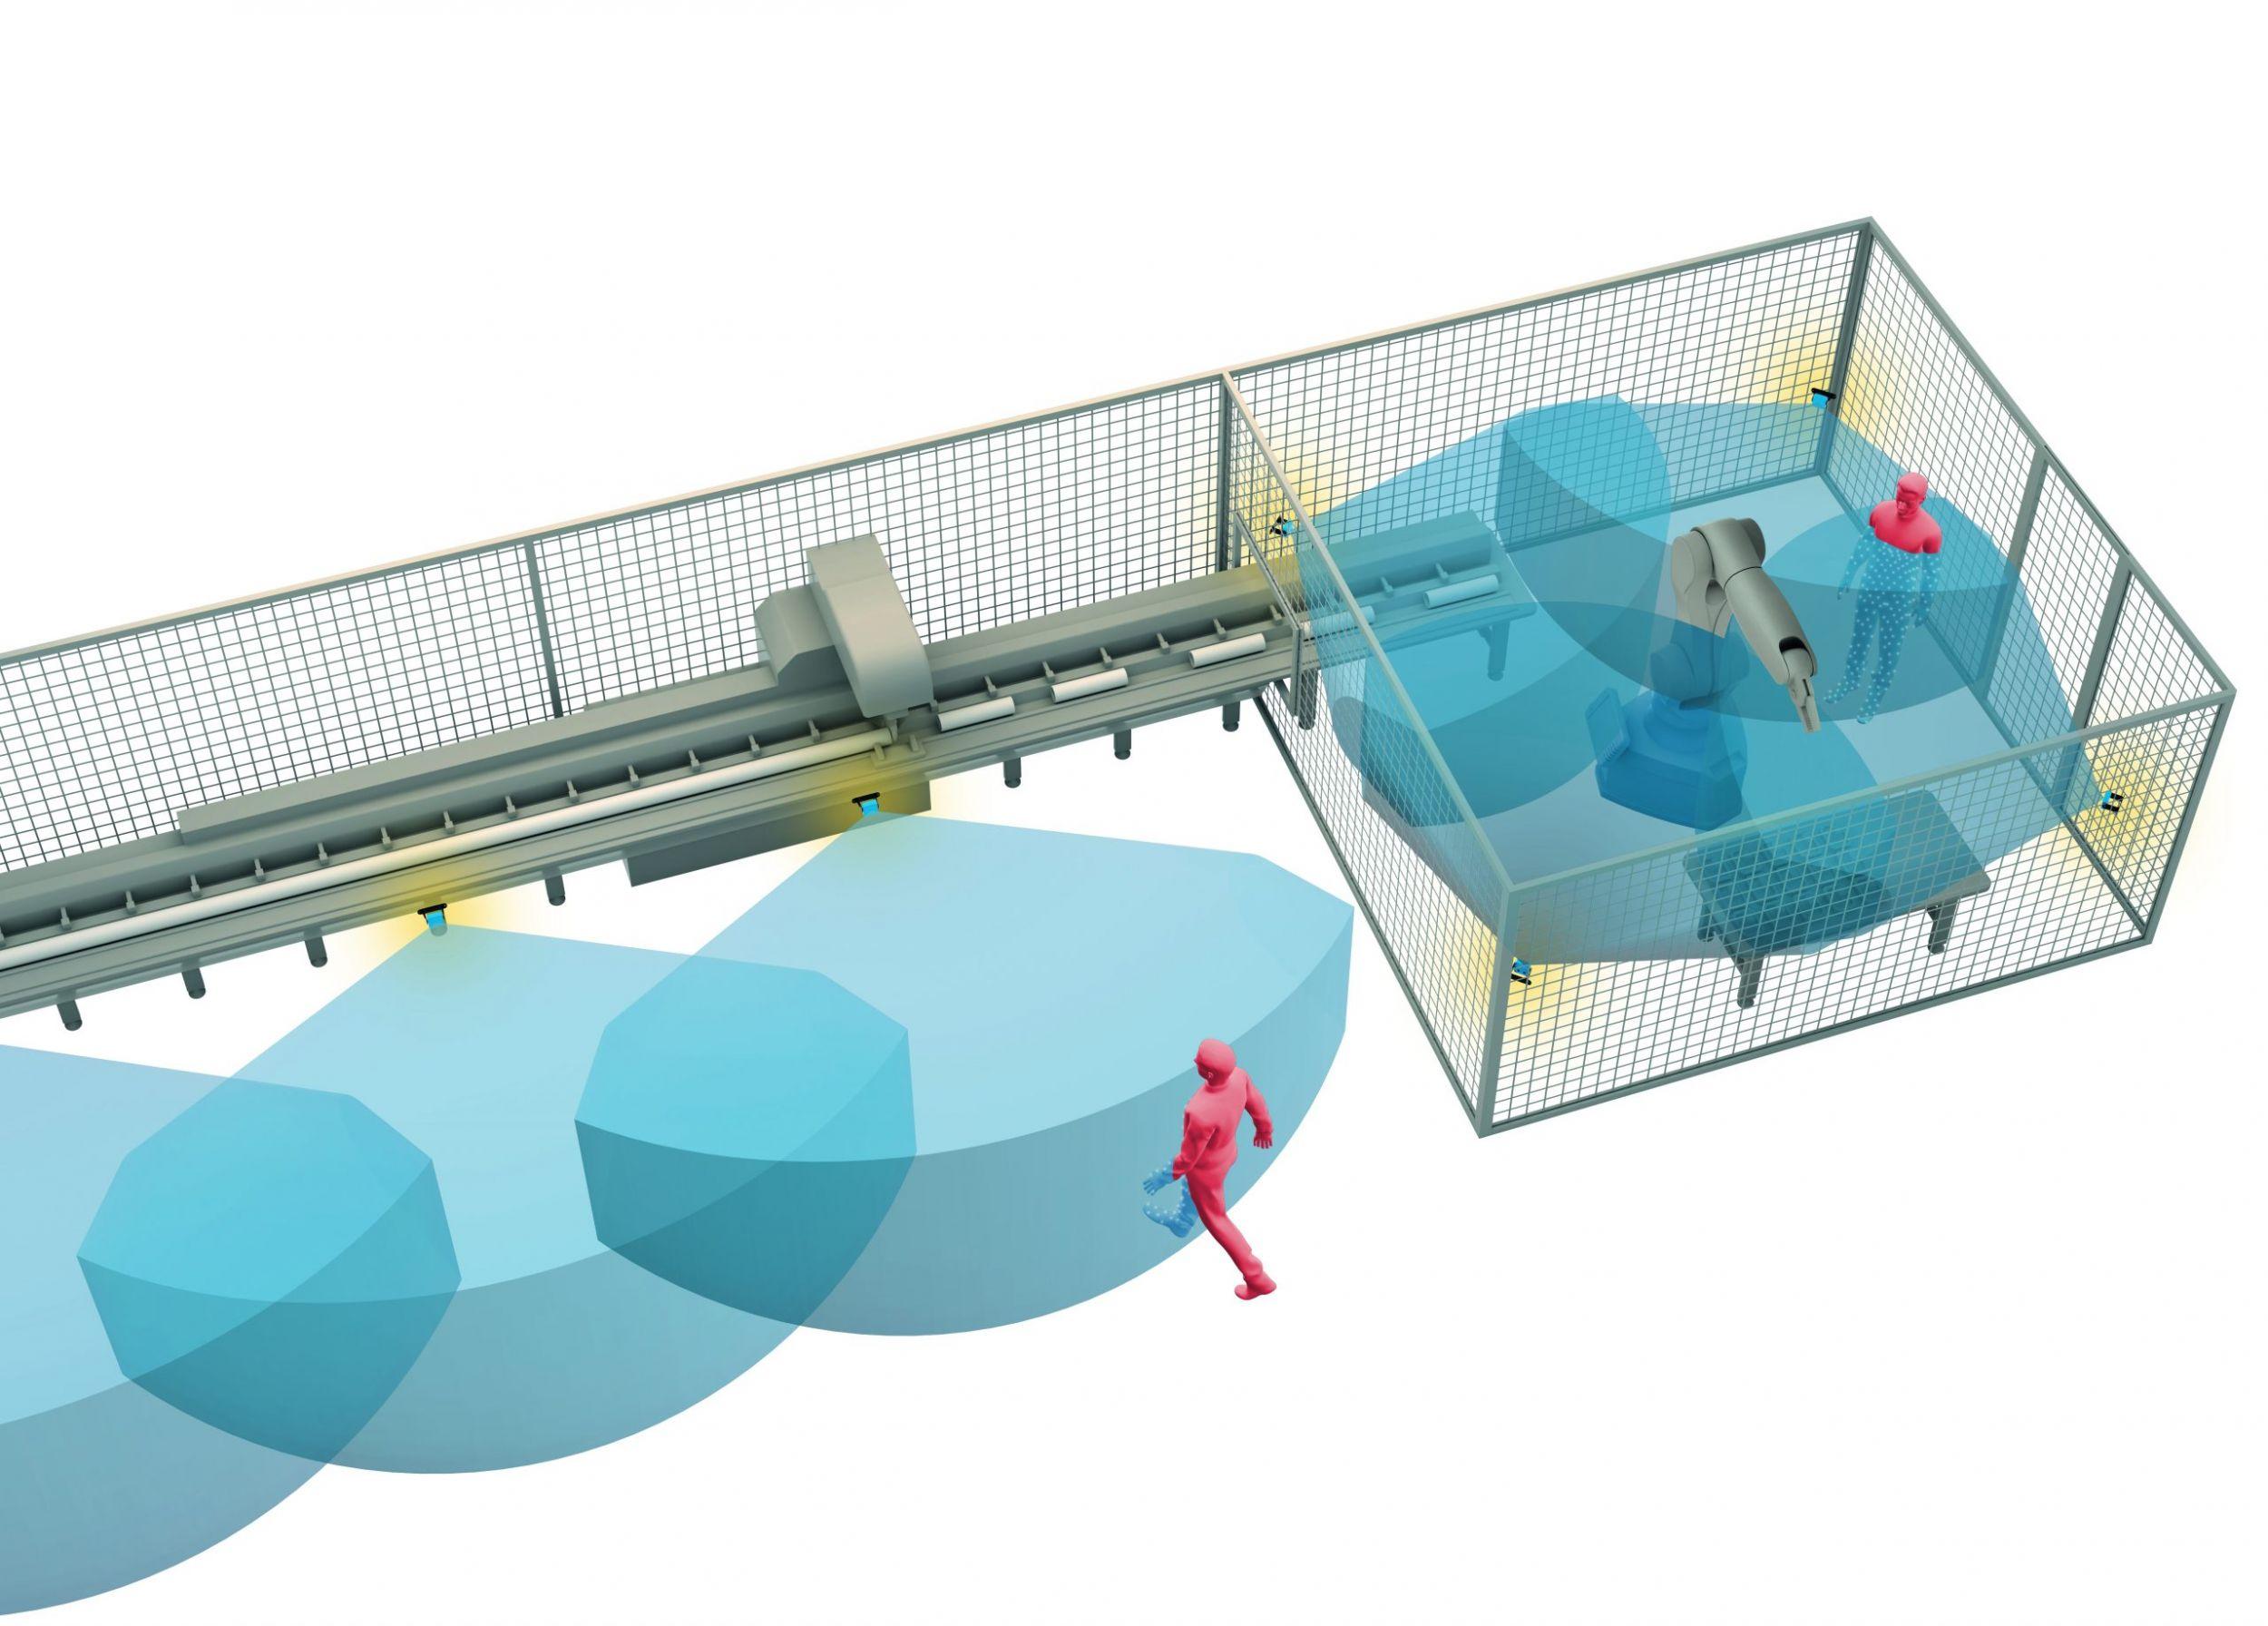 SIL2/Pld radar-based sensor system for access protection